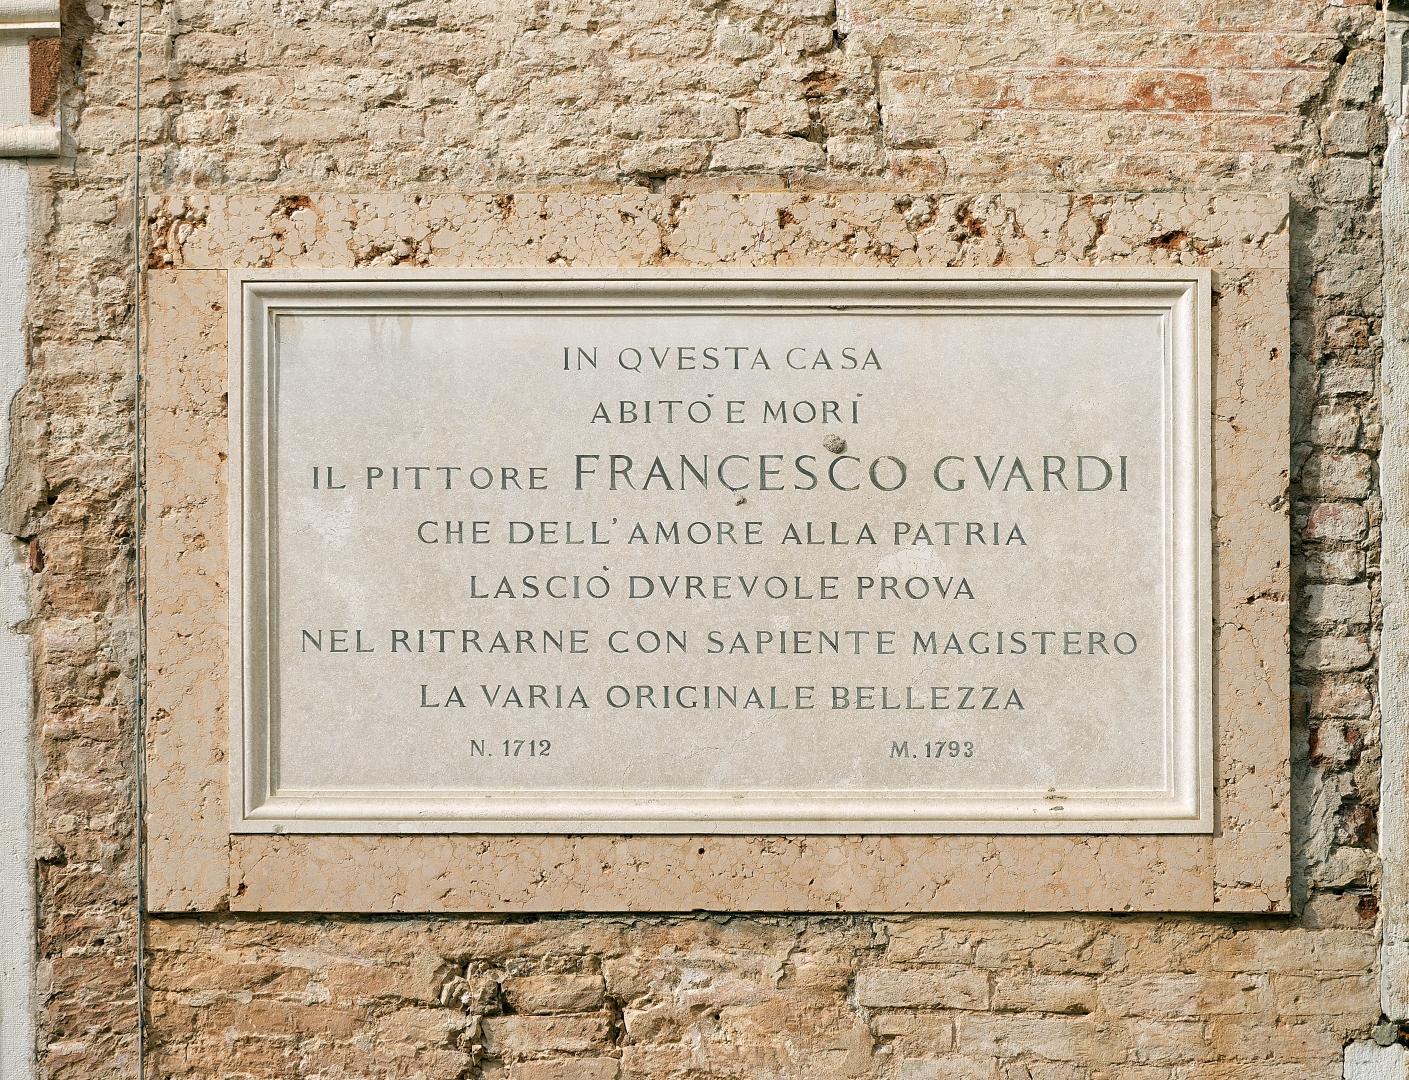 Мемориальная доска на фасаде дома Франческо Гварди в Каннареджо, Венеция